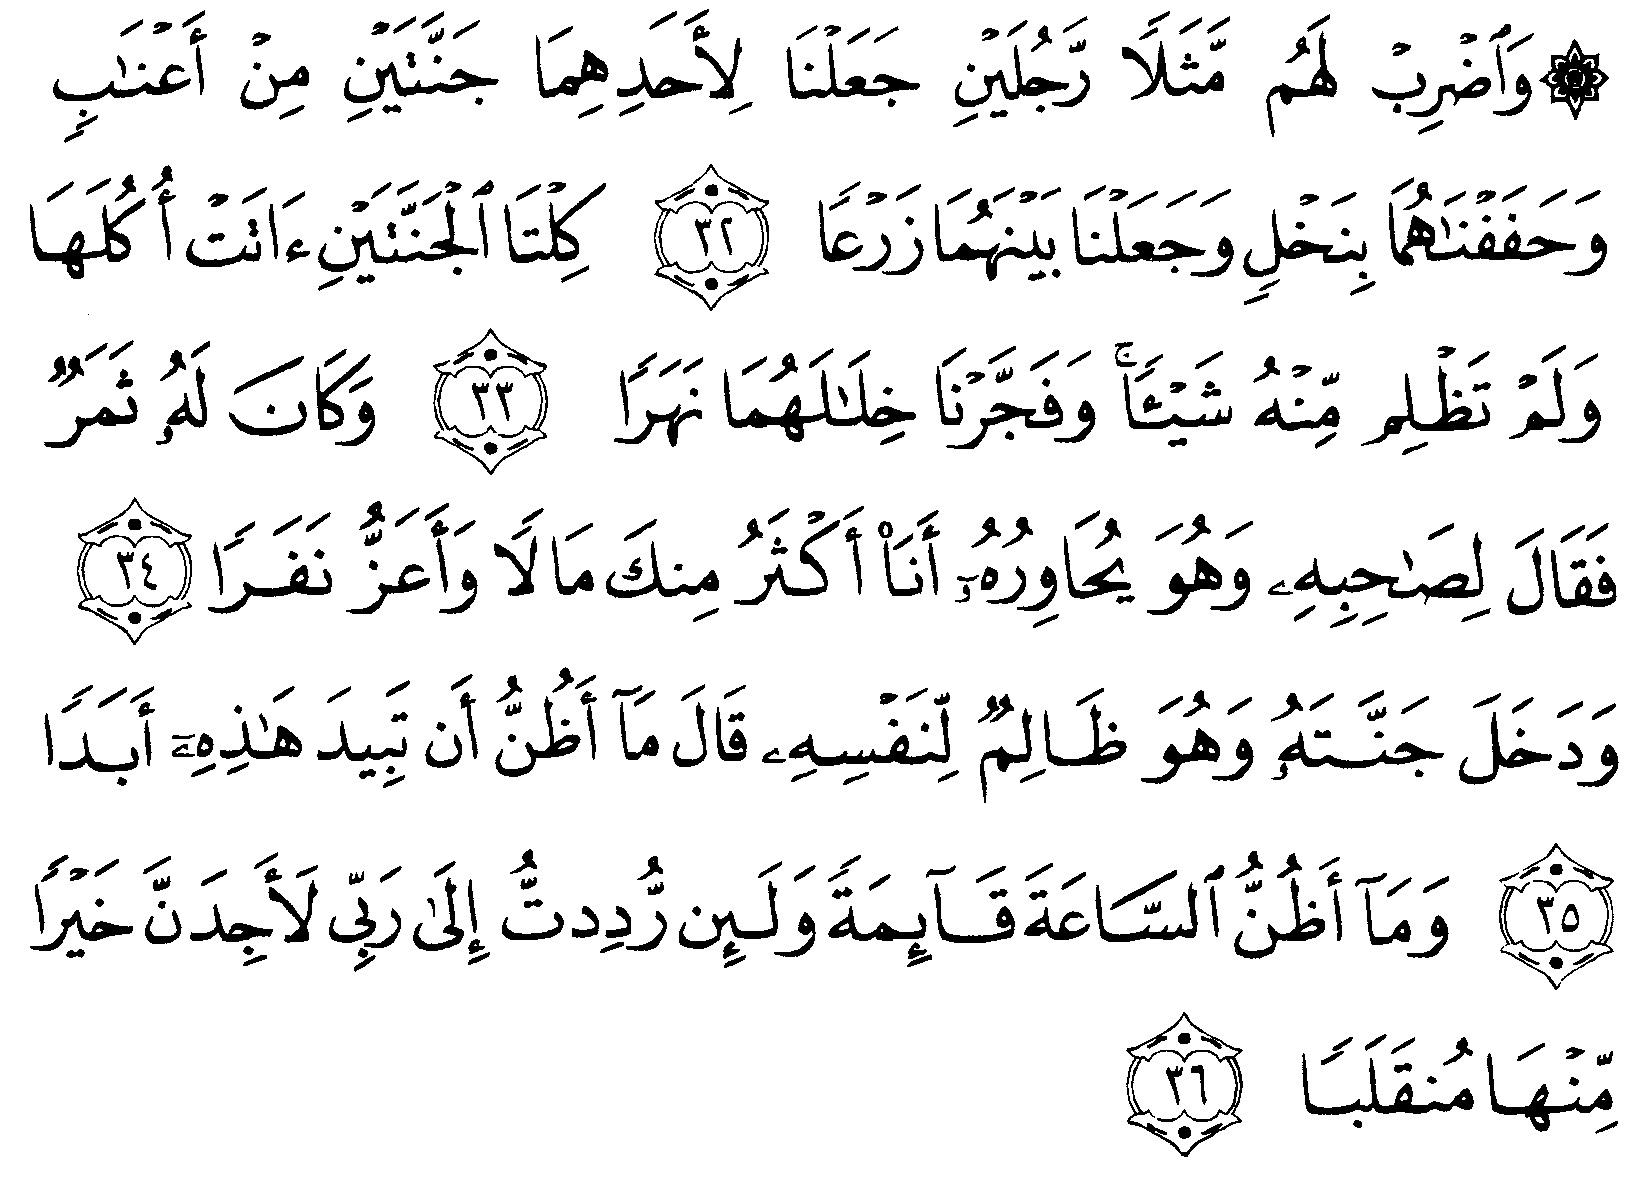 Tafsir Ibnu Katsir Surah Al Kahfi Ayat 32 36 Alquranmulia